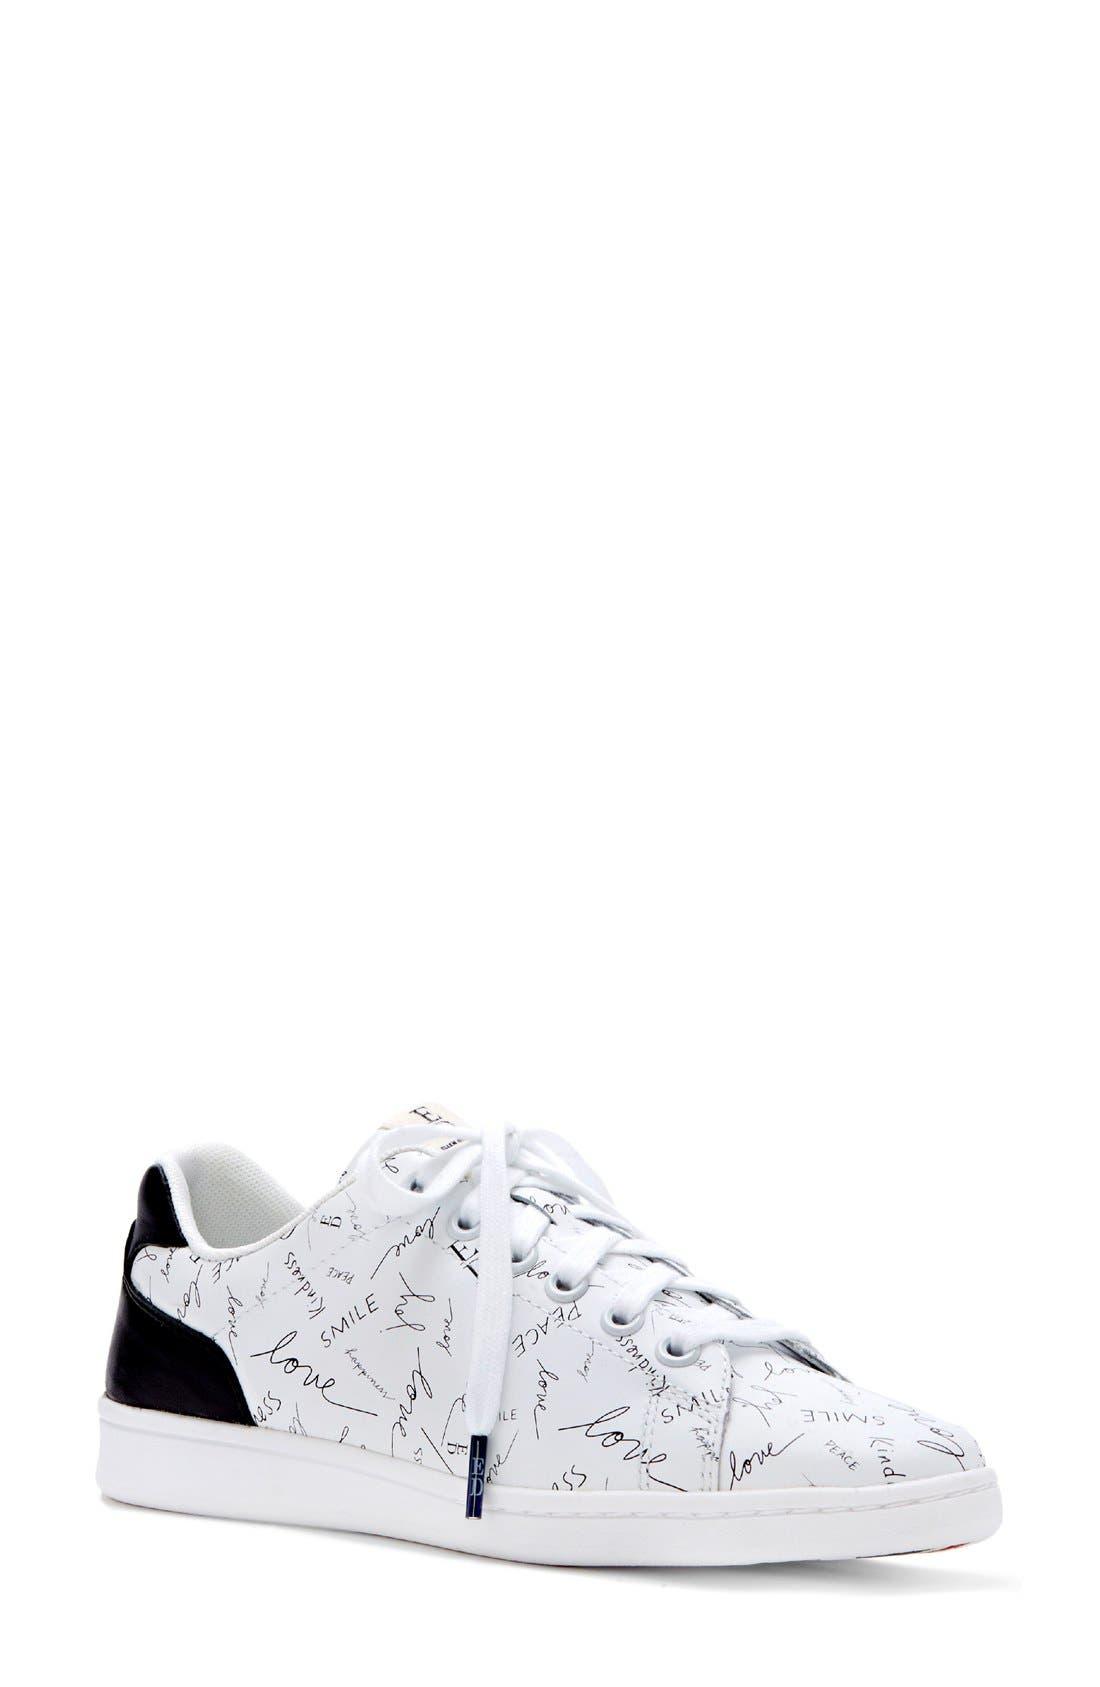 Alternate Image 1 Selected - ED Ellen DeGeneres Chaprint Sneaker (Women)